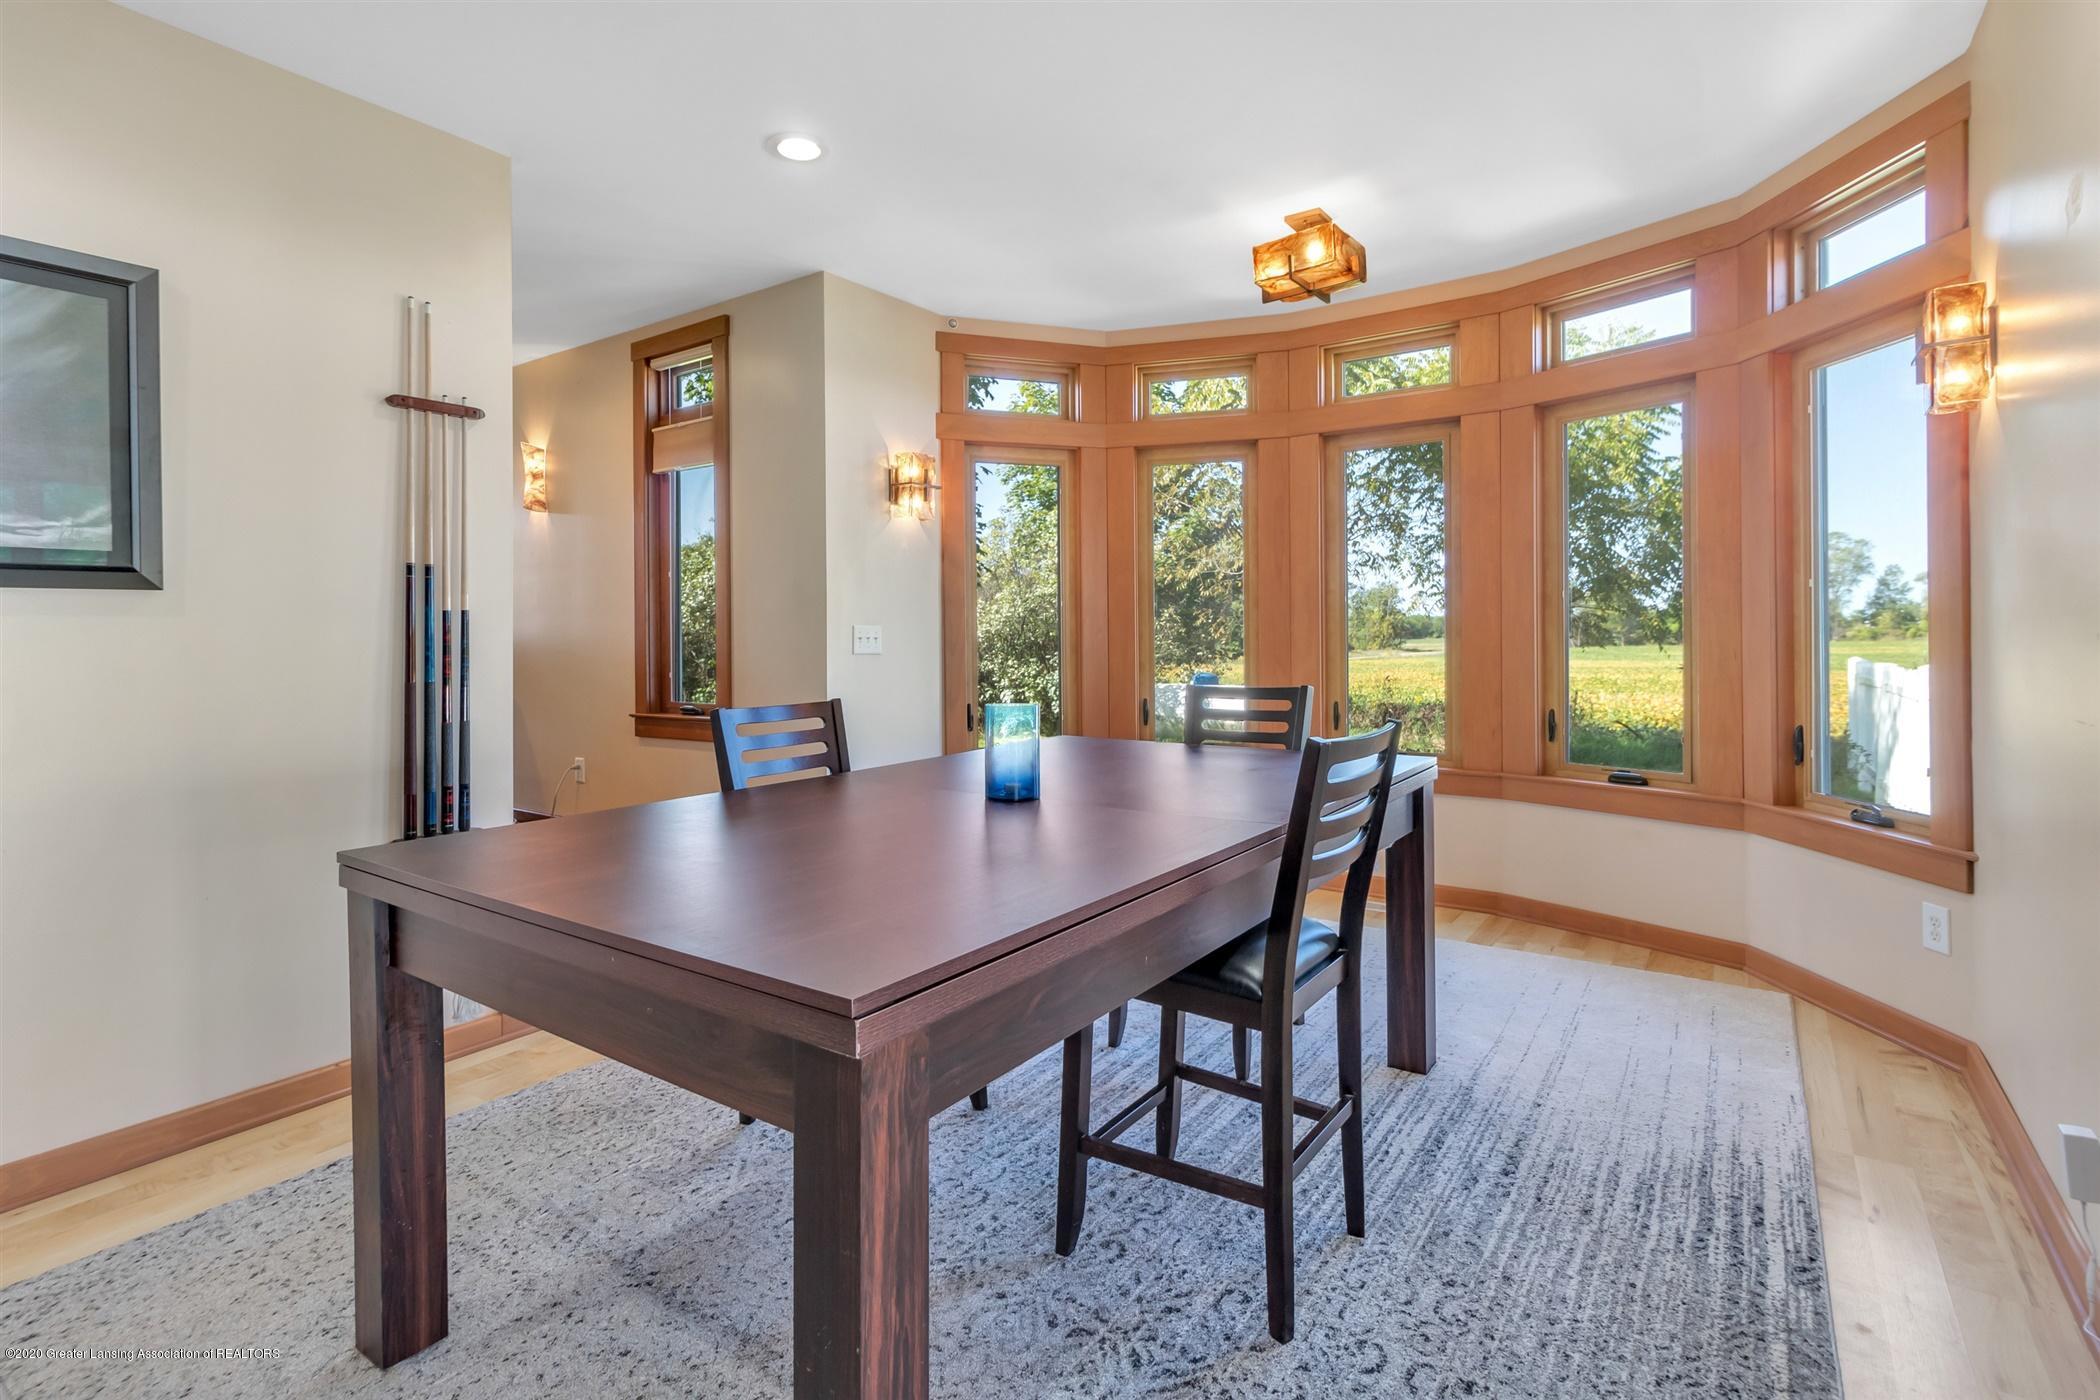 7346 W Cutler Rd - BAY WINDOW DINING ROOM - 18